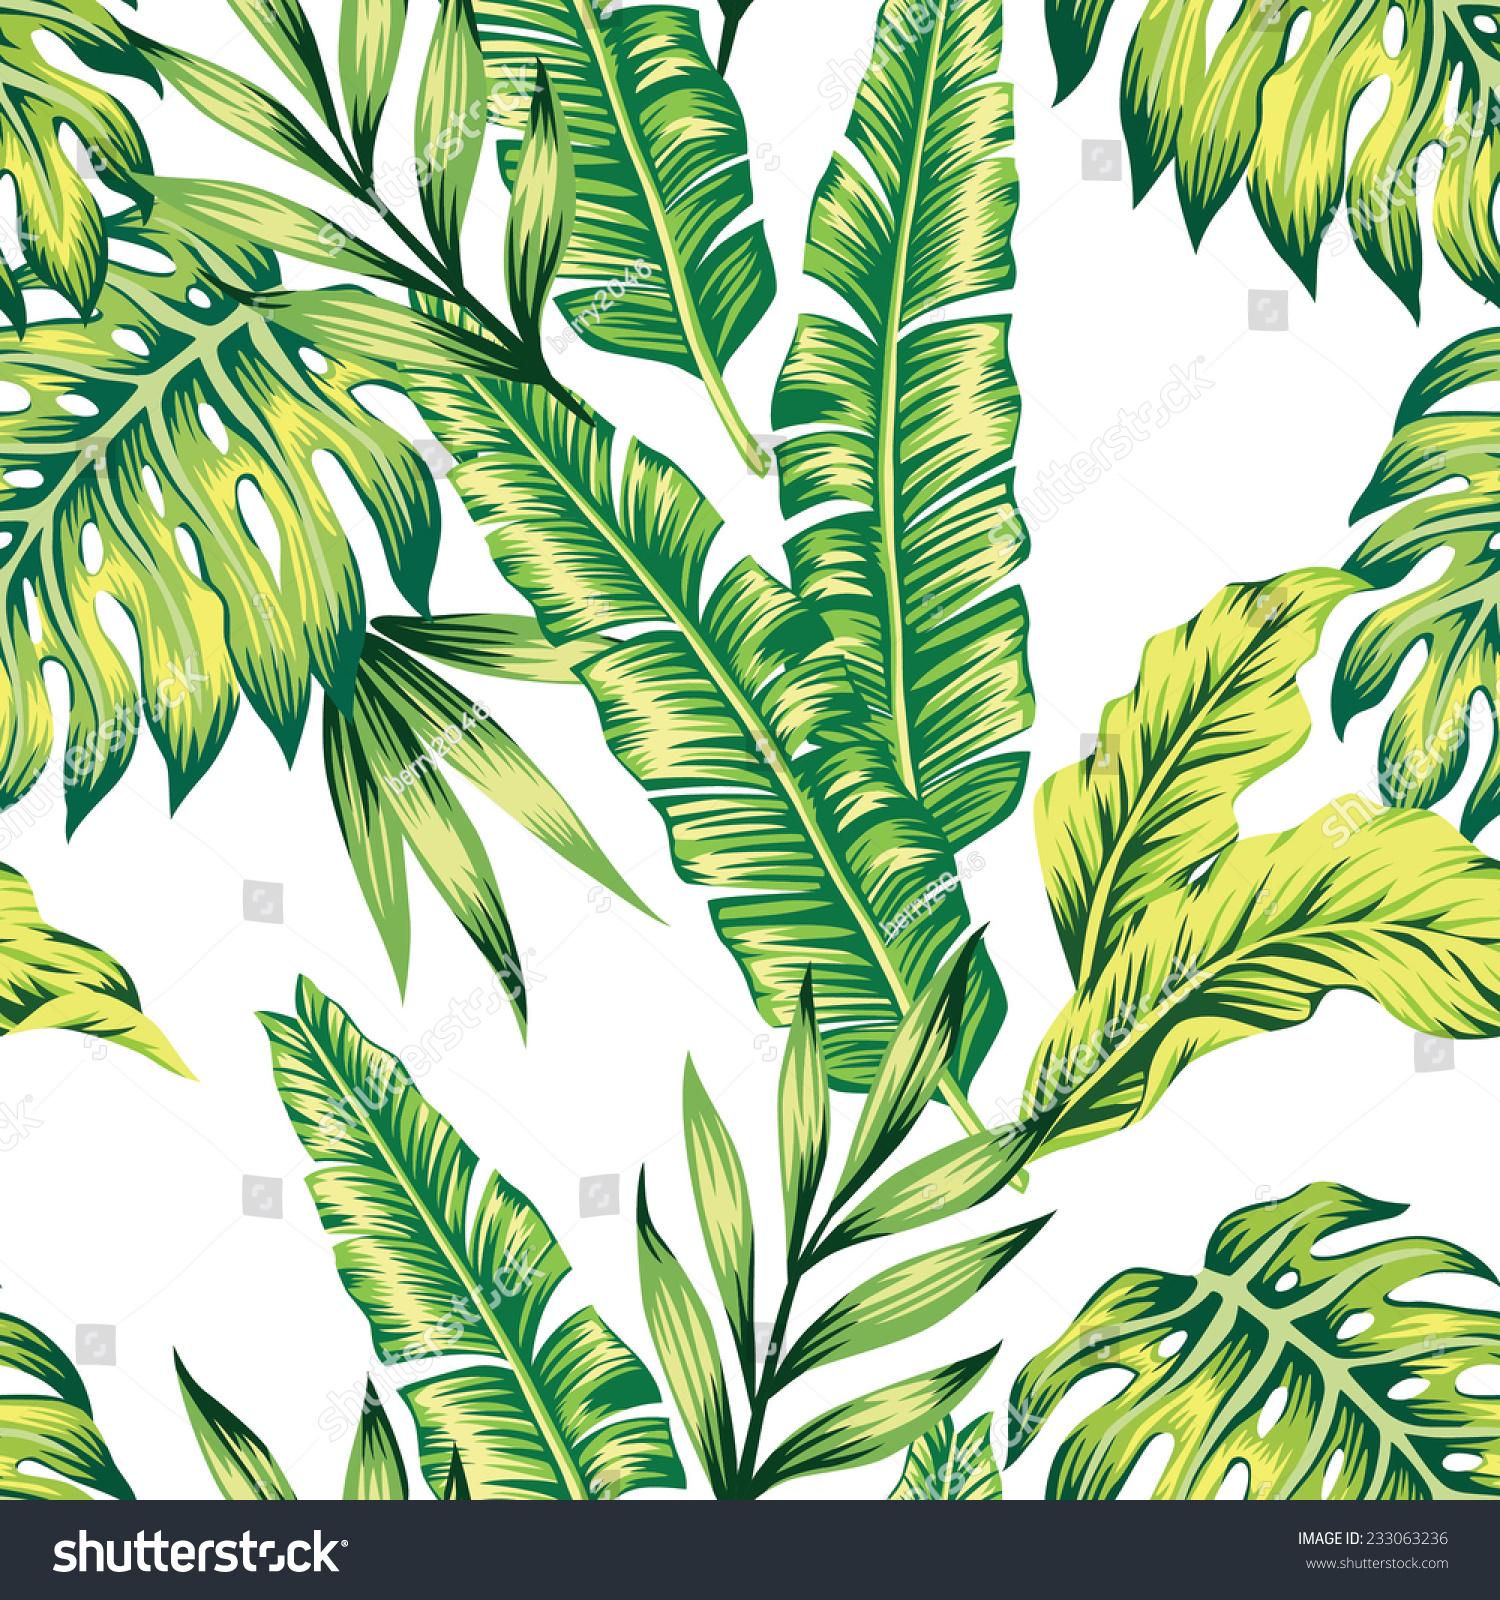 Print Summer Exotic Jungle Plant Tropical Image Vectorielle